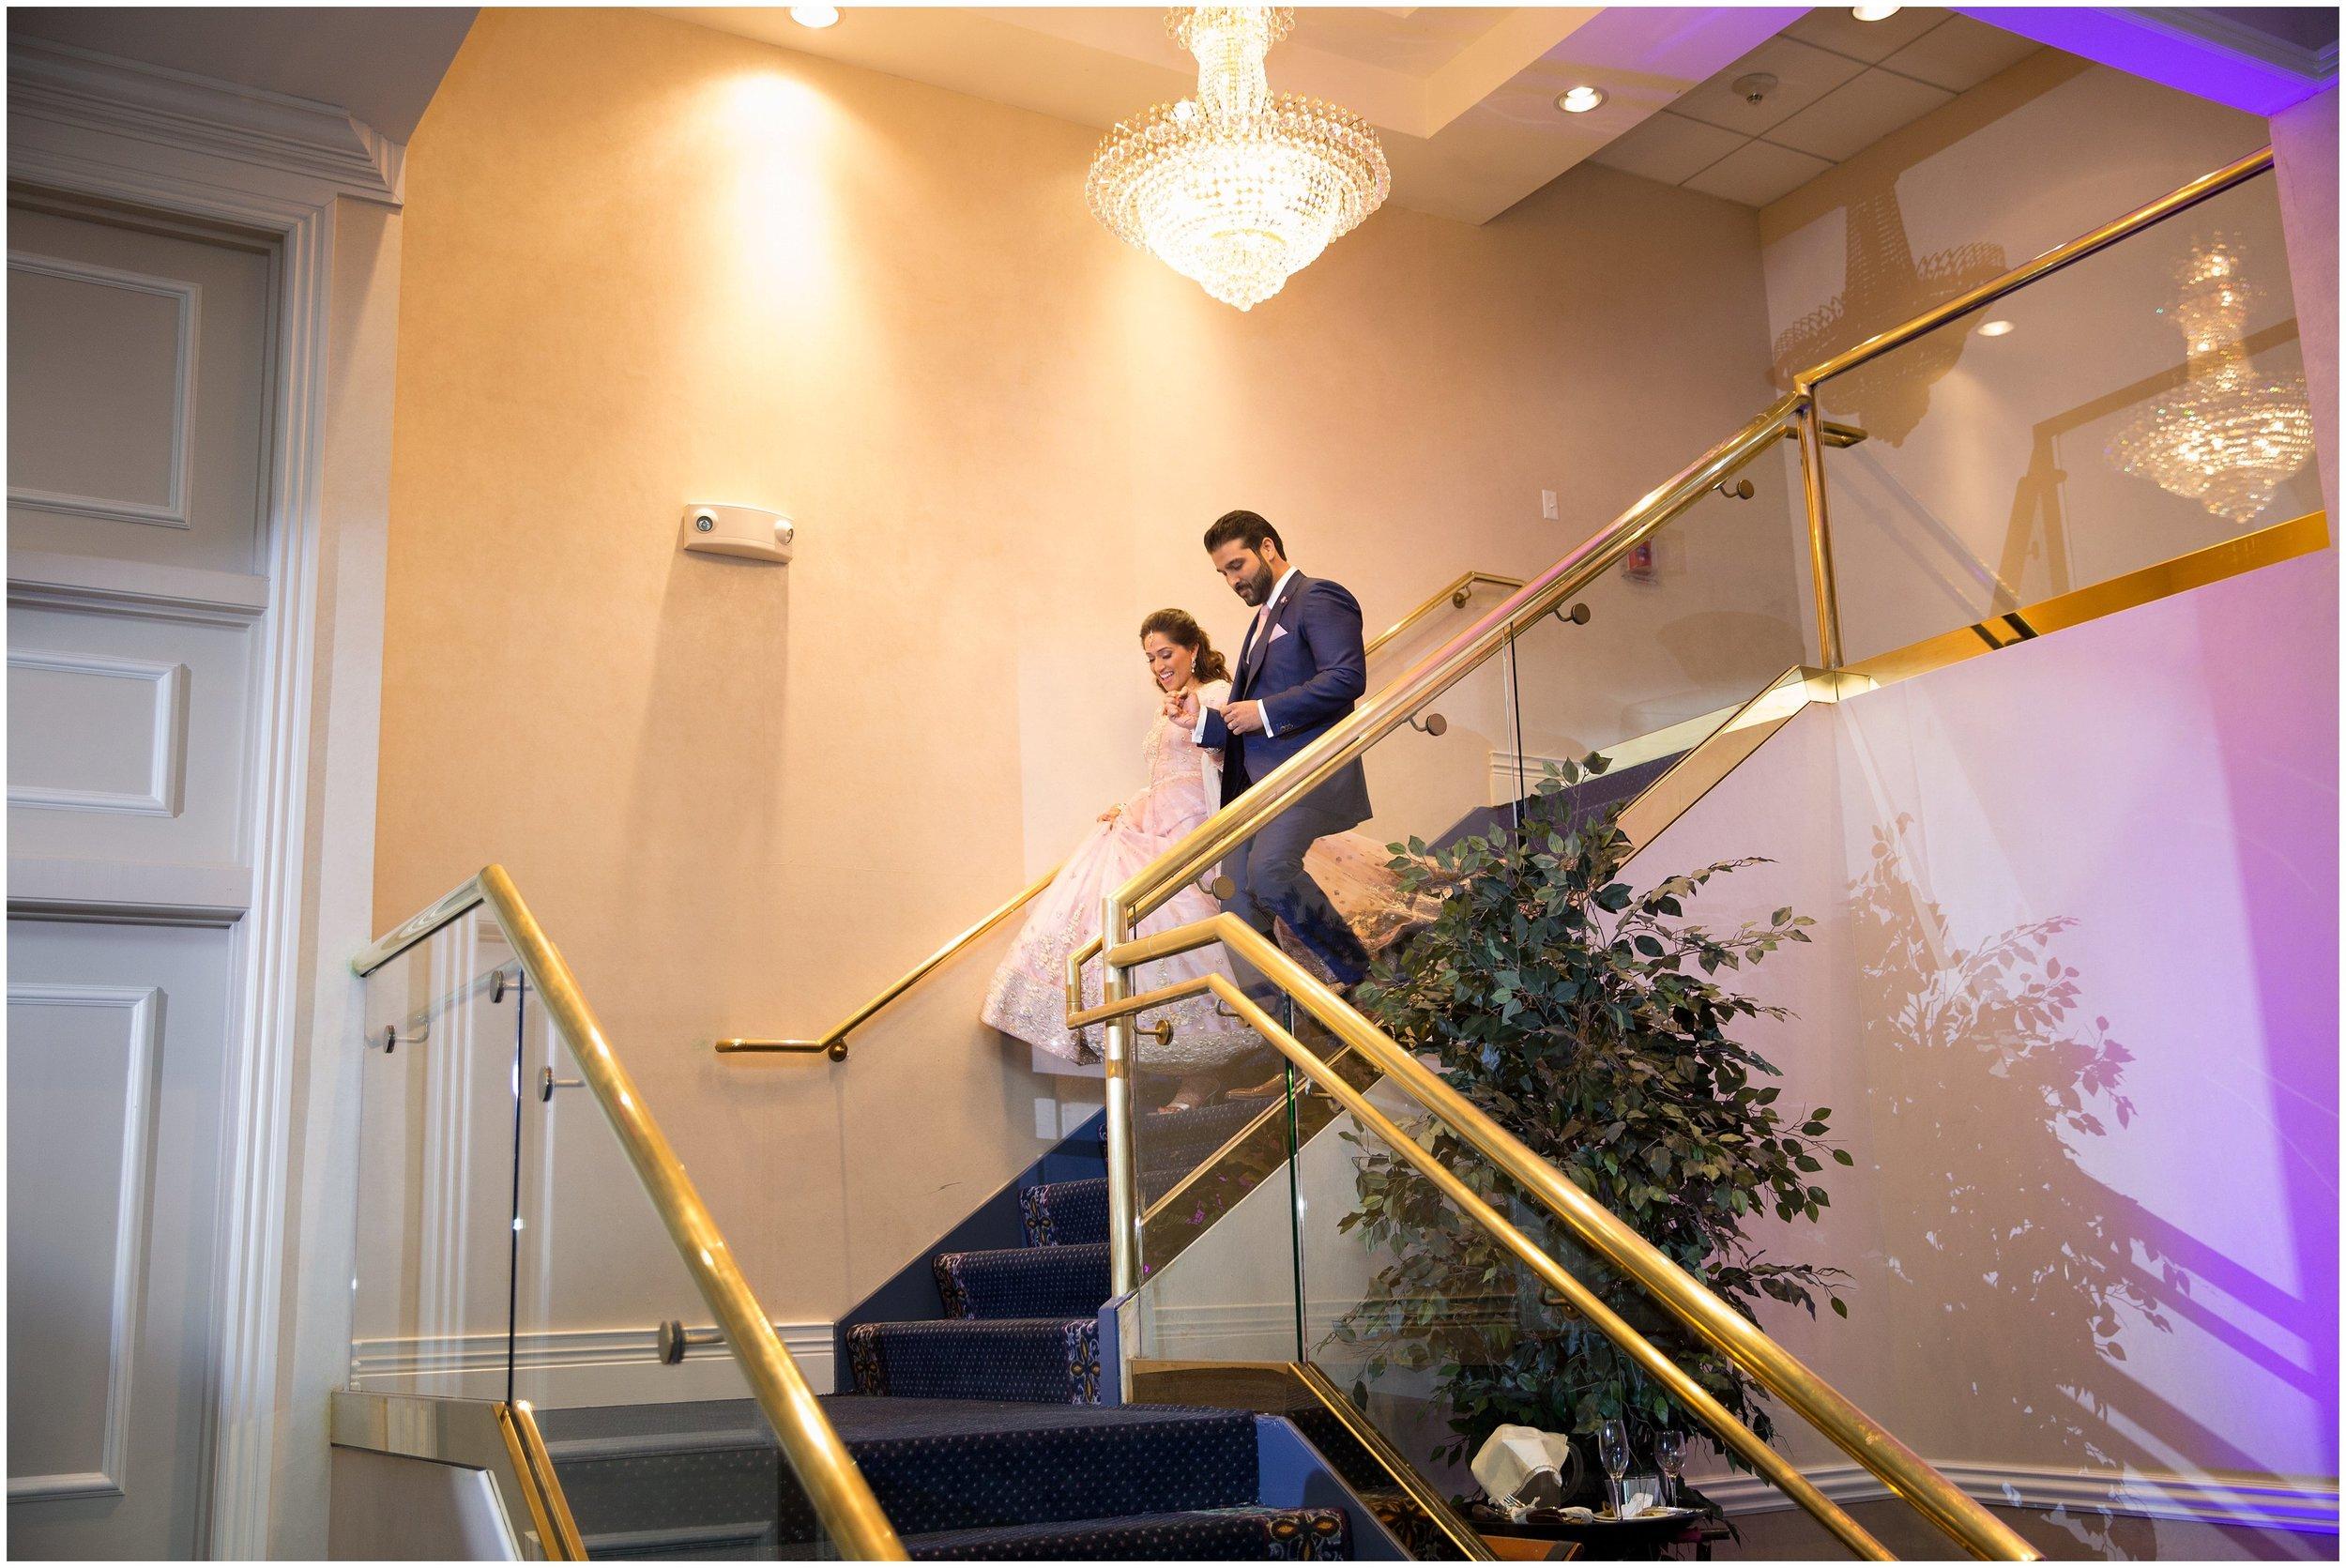 Le Cape Weddings - South Asian Wedding in Illinois - Tanvi and Anshul -1981_LuxuryDestinationPhotographer.jpg